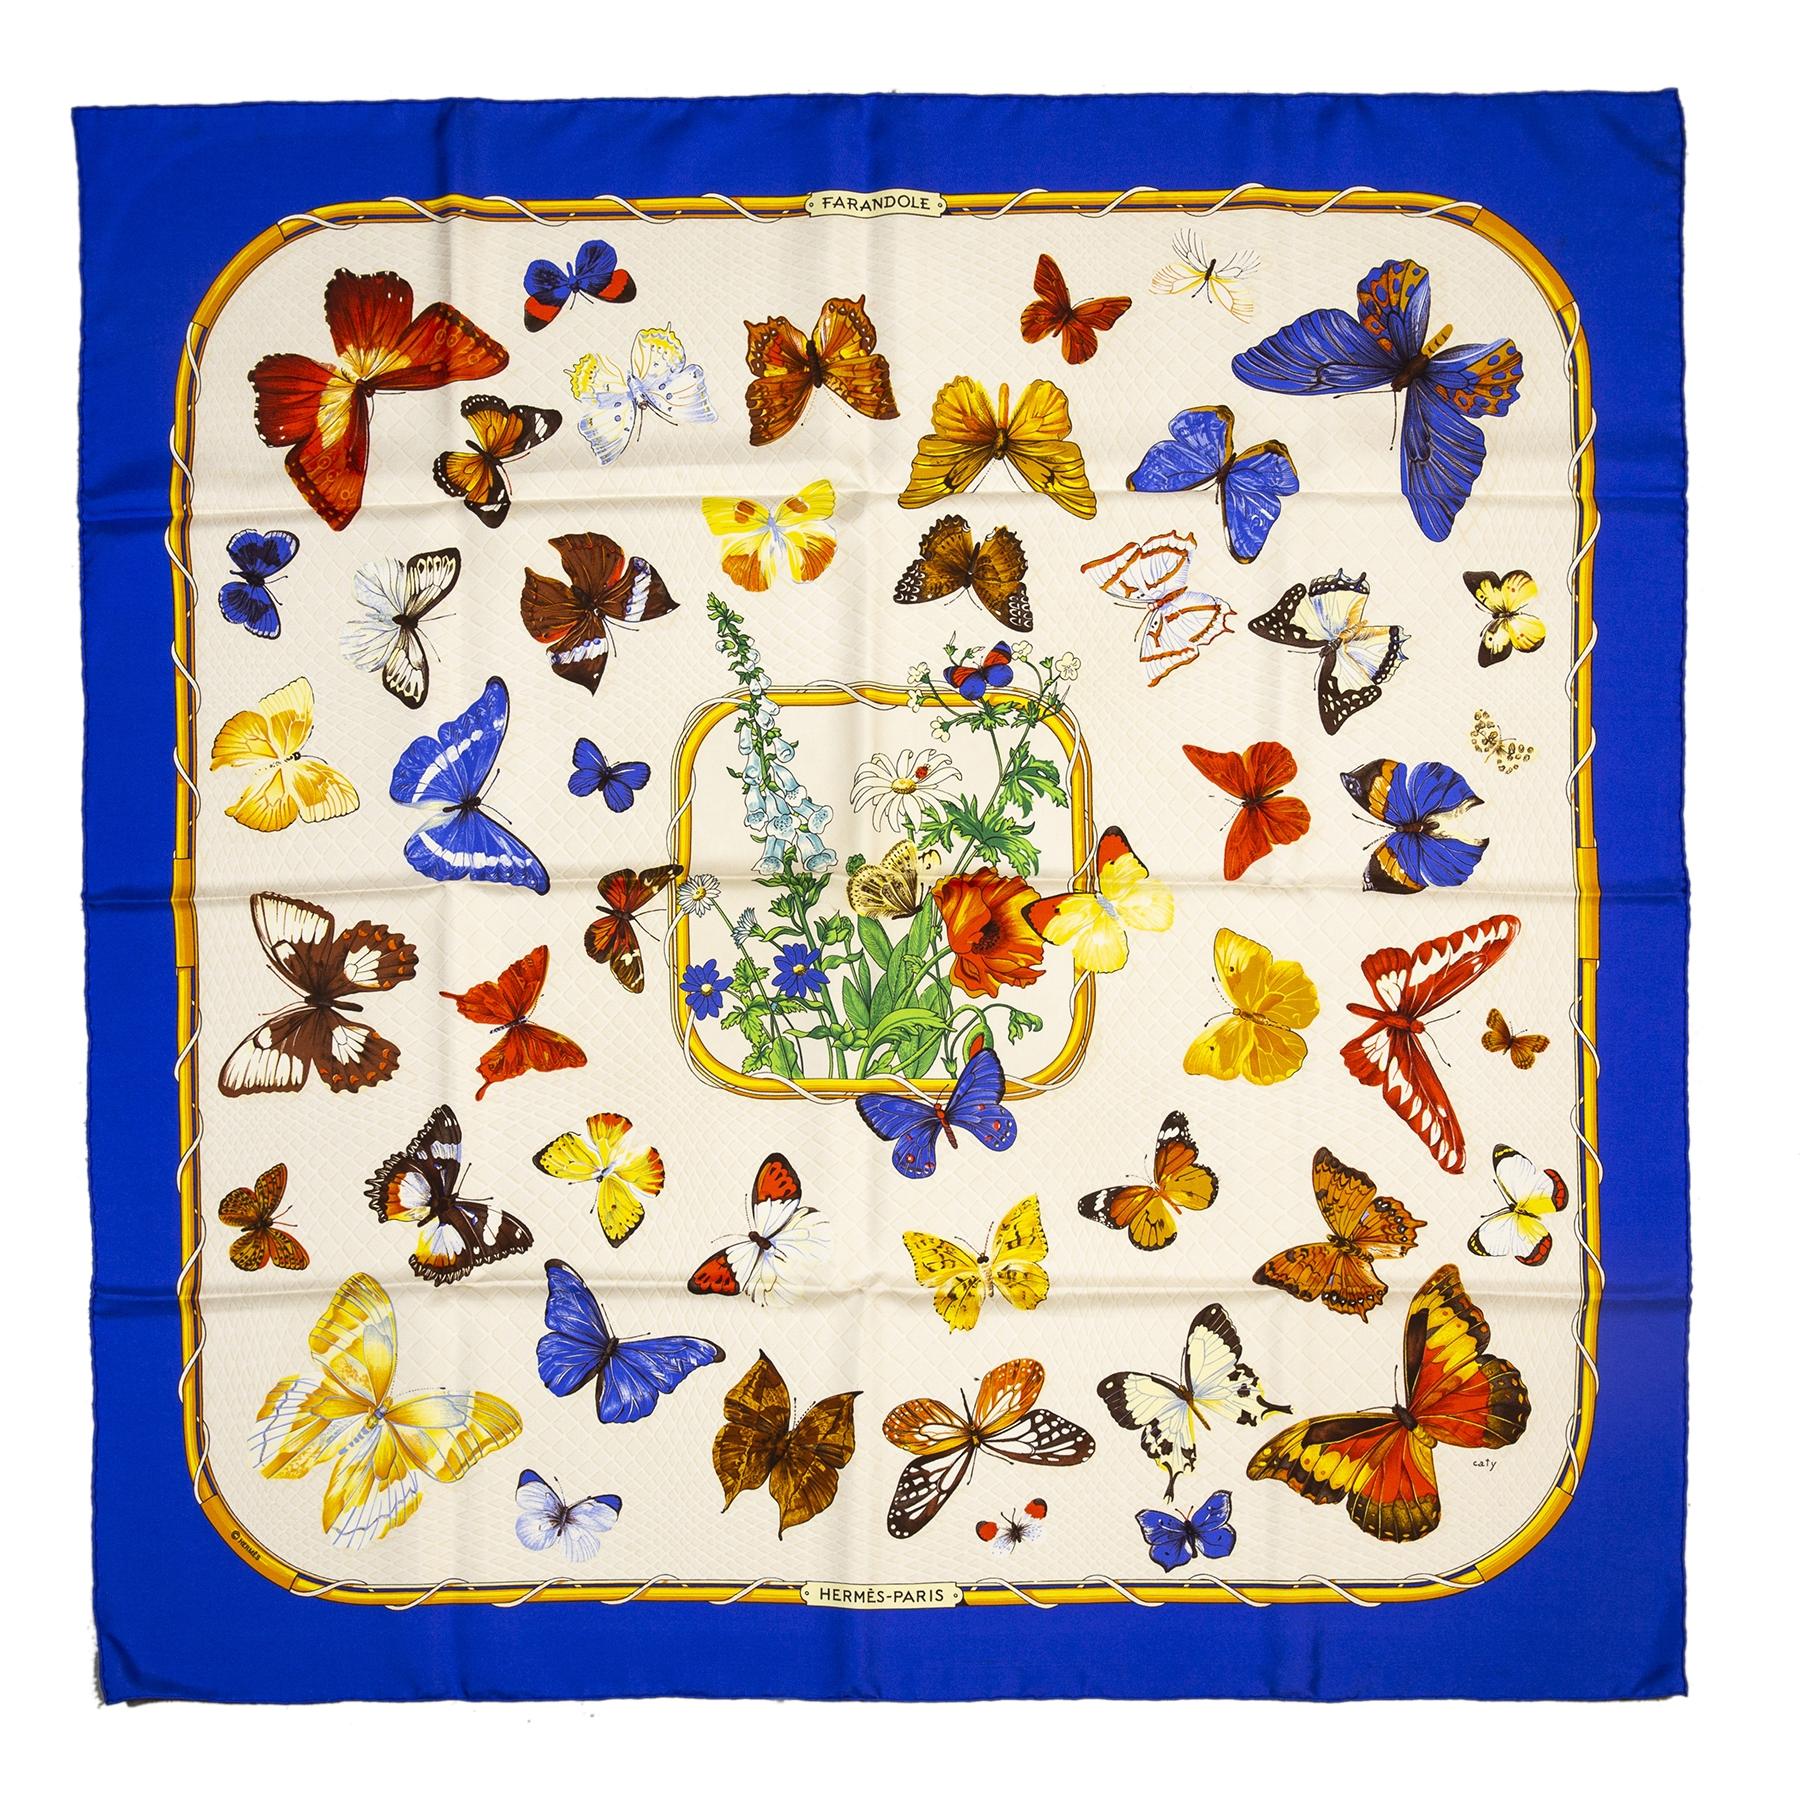 Authentieke tweedehands Hermès silk blue butterfly scarf juiste prijs veilig online winkelen LabelLOV webshop luxe merken winkelen Antwerpen België mode fashion